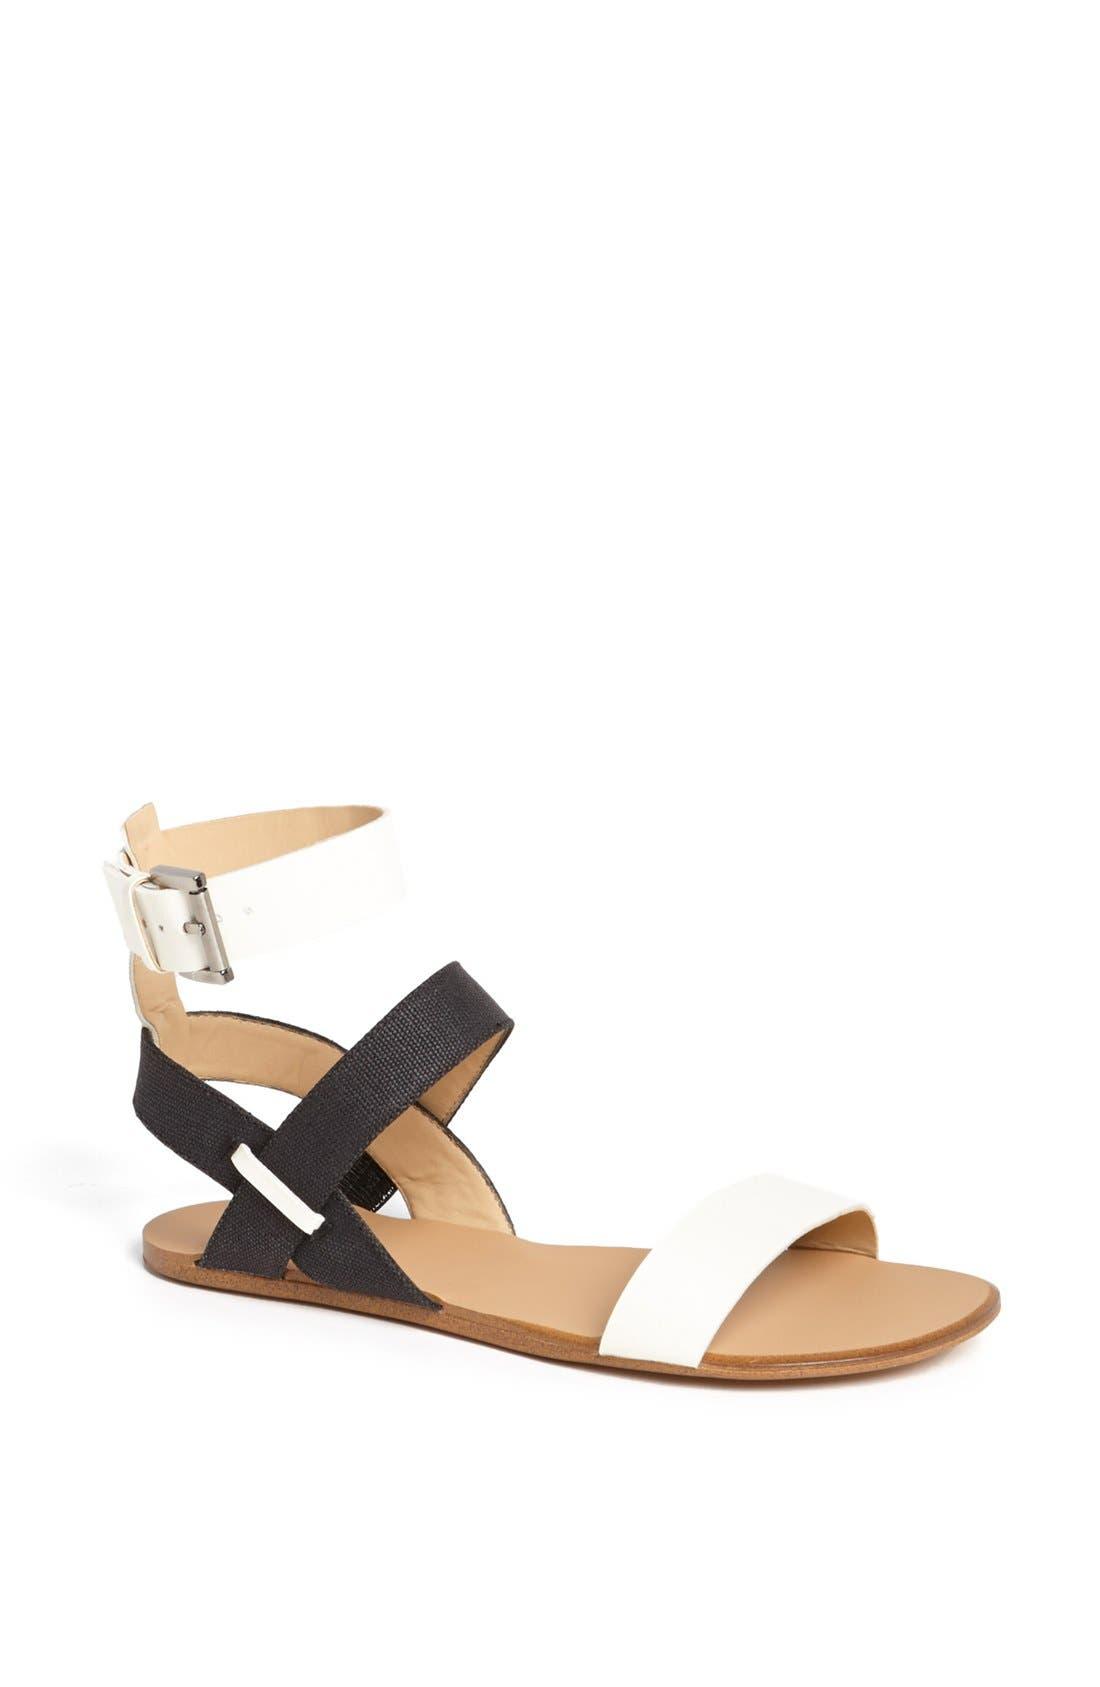 Main Image - Joe's 'Eryn' Sandal